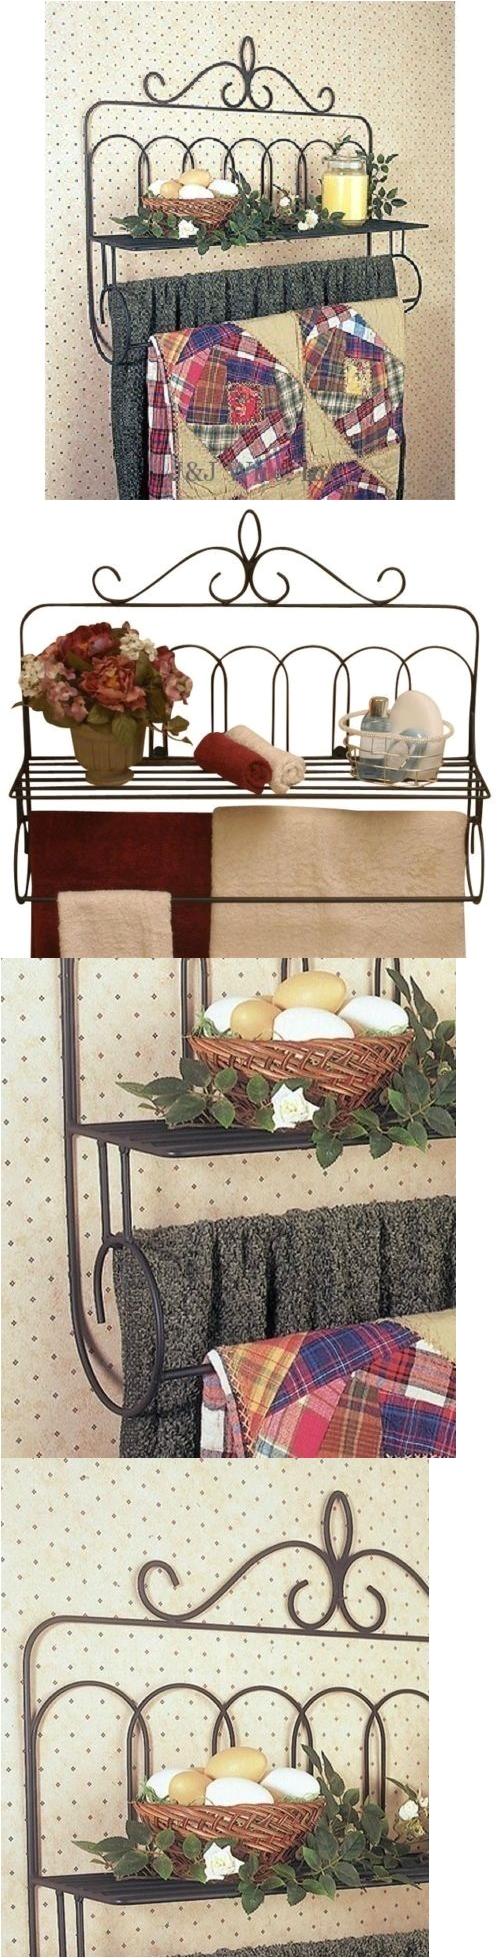 quilt hangers and stands 83959 quilt rack wall mount hanger with shelf metal blanket display